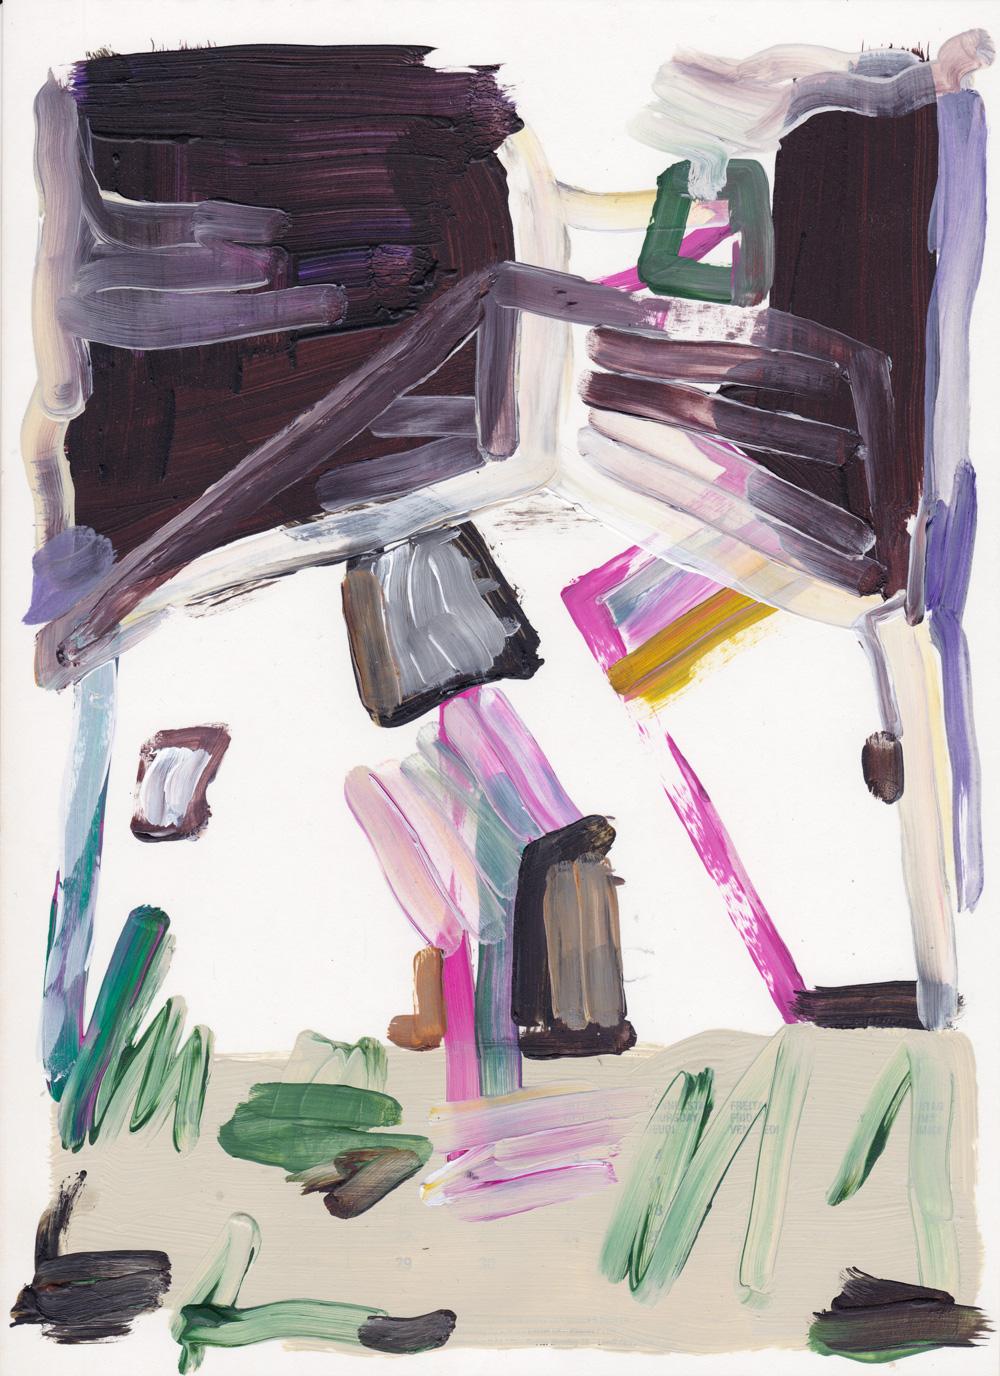 2020-05-DA-Painting-TrialandError-Scan600dpi-3-web